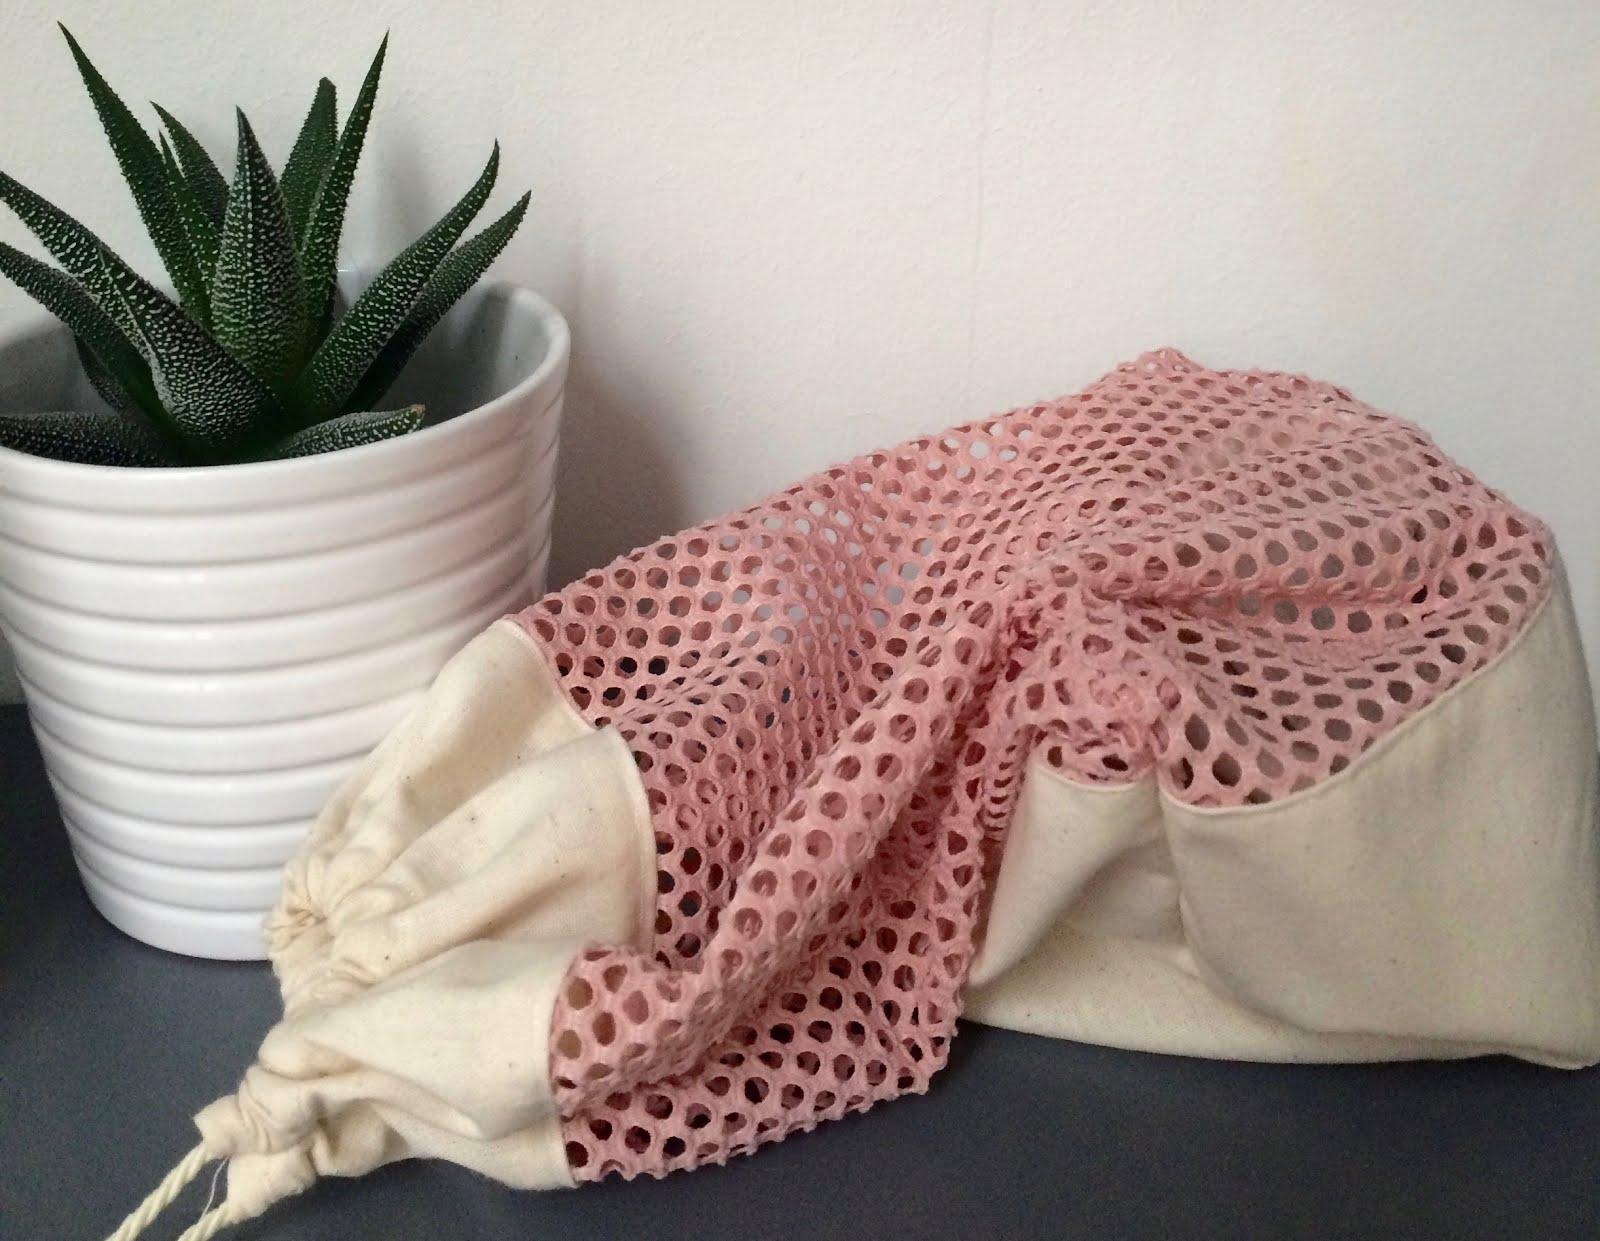 diy un filet de lavage. Black Bedroom Furniture Sets. Home Design Ideas